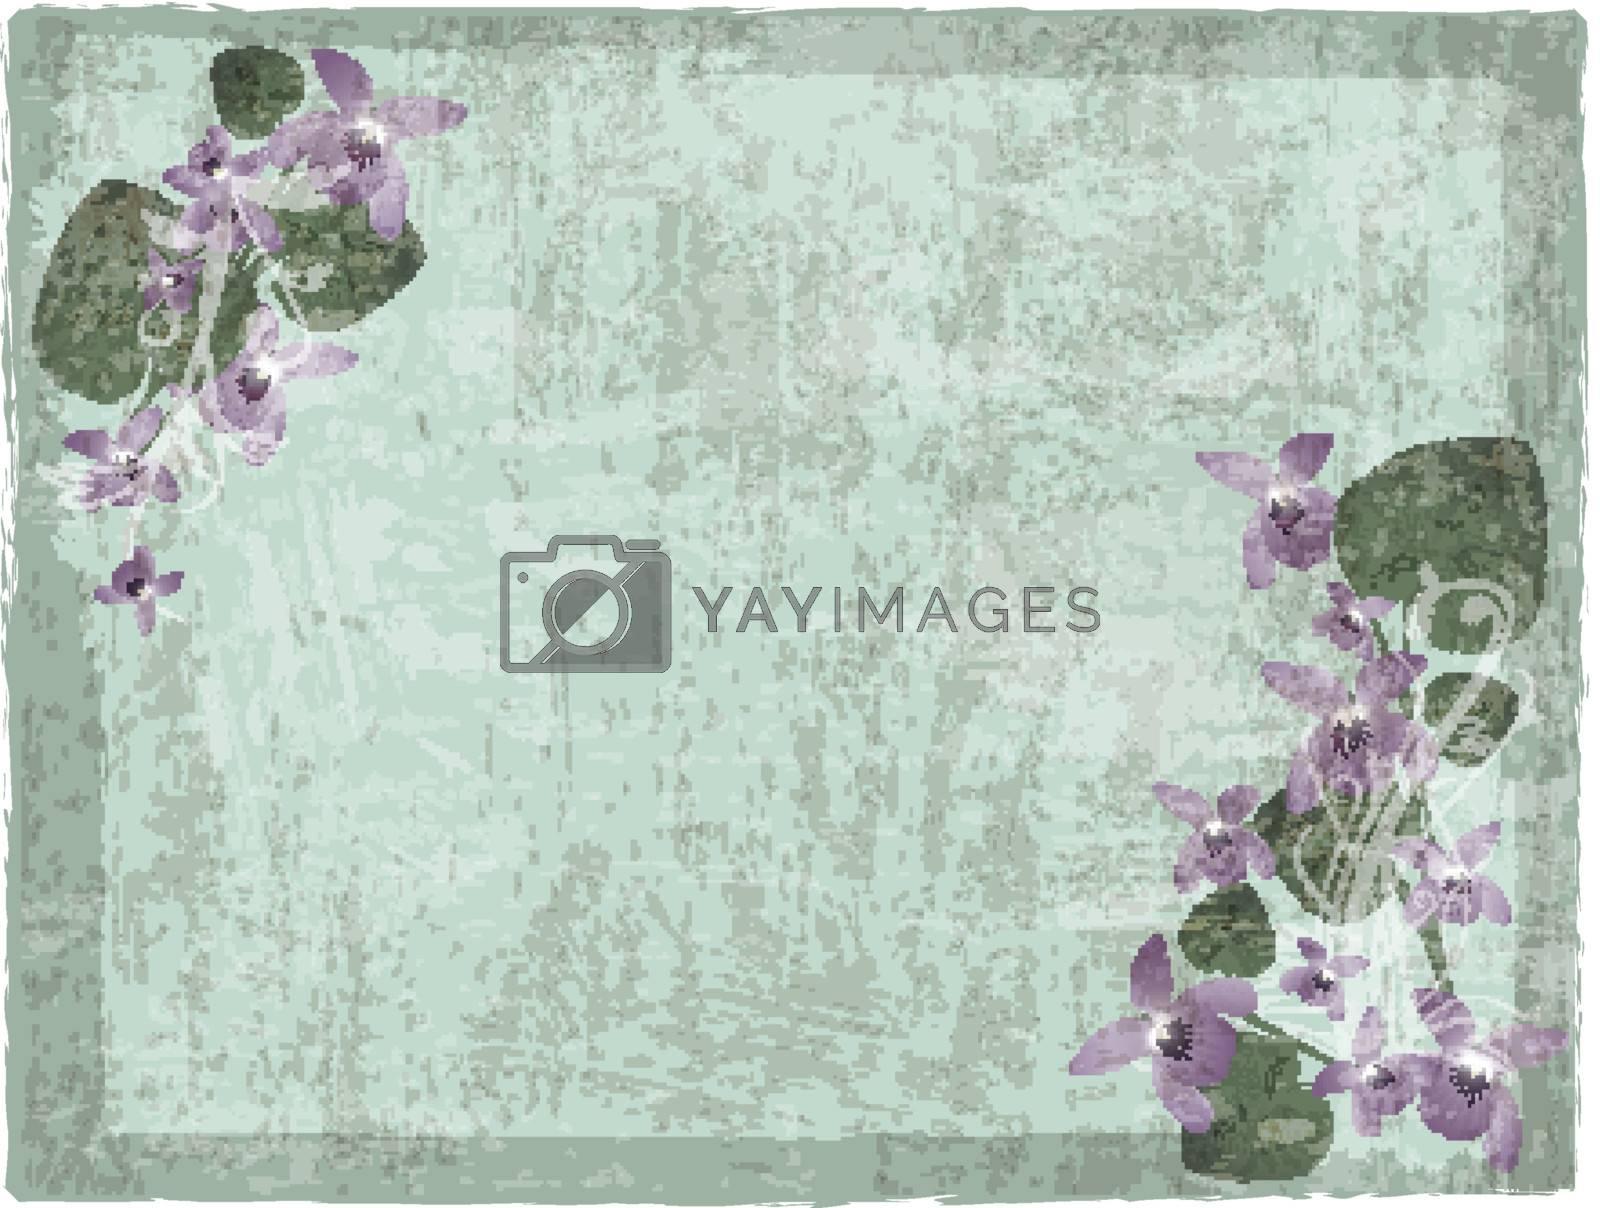 Vintage grunge floral background with wild violet flowers